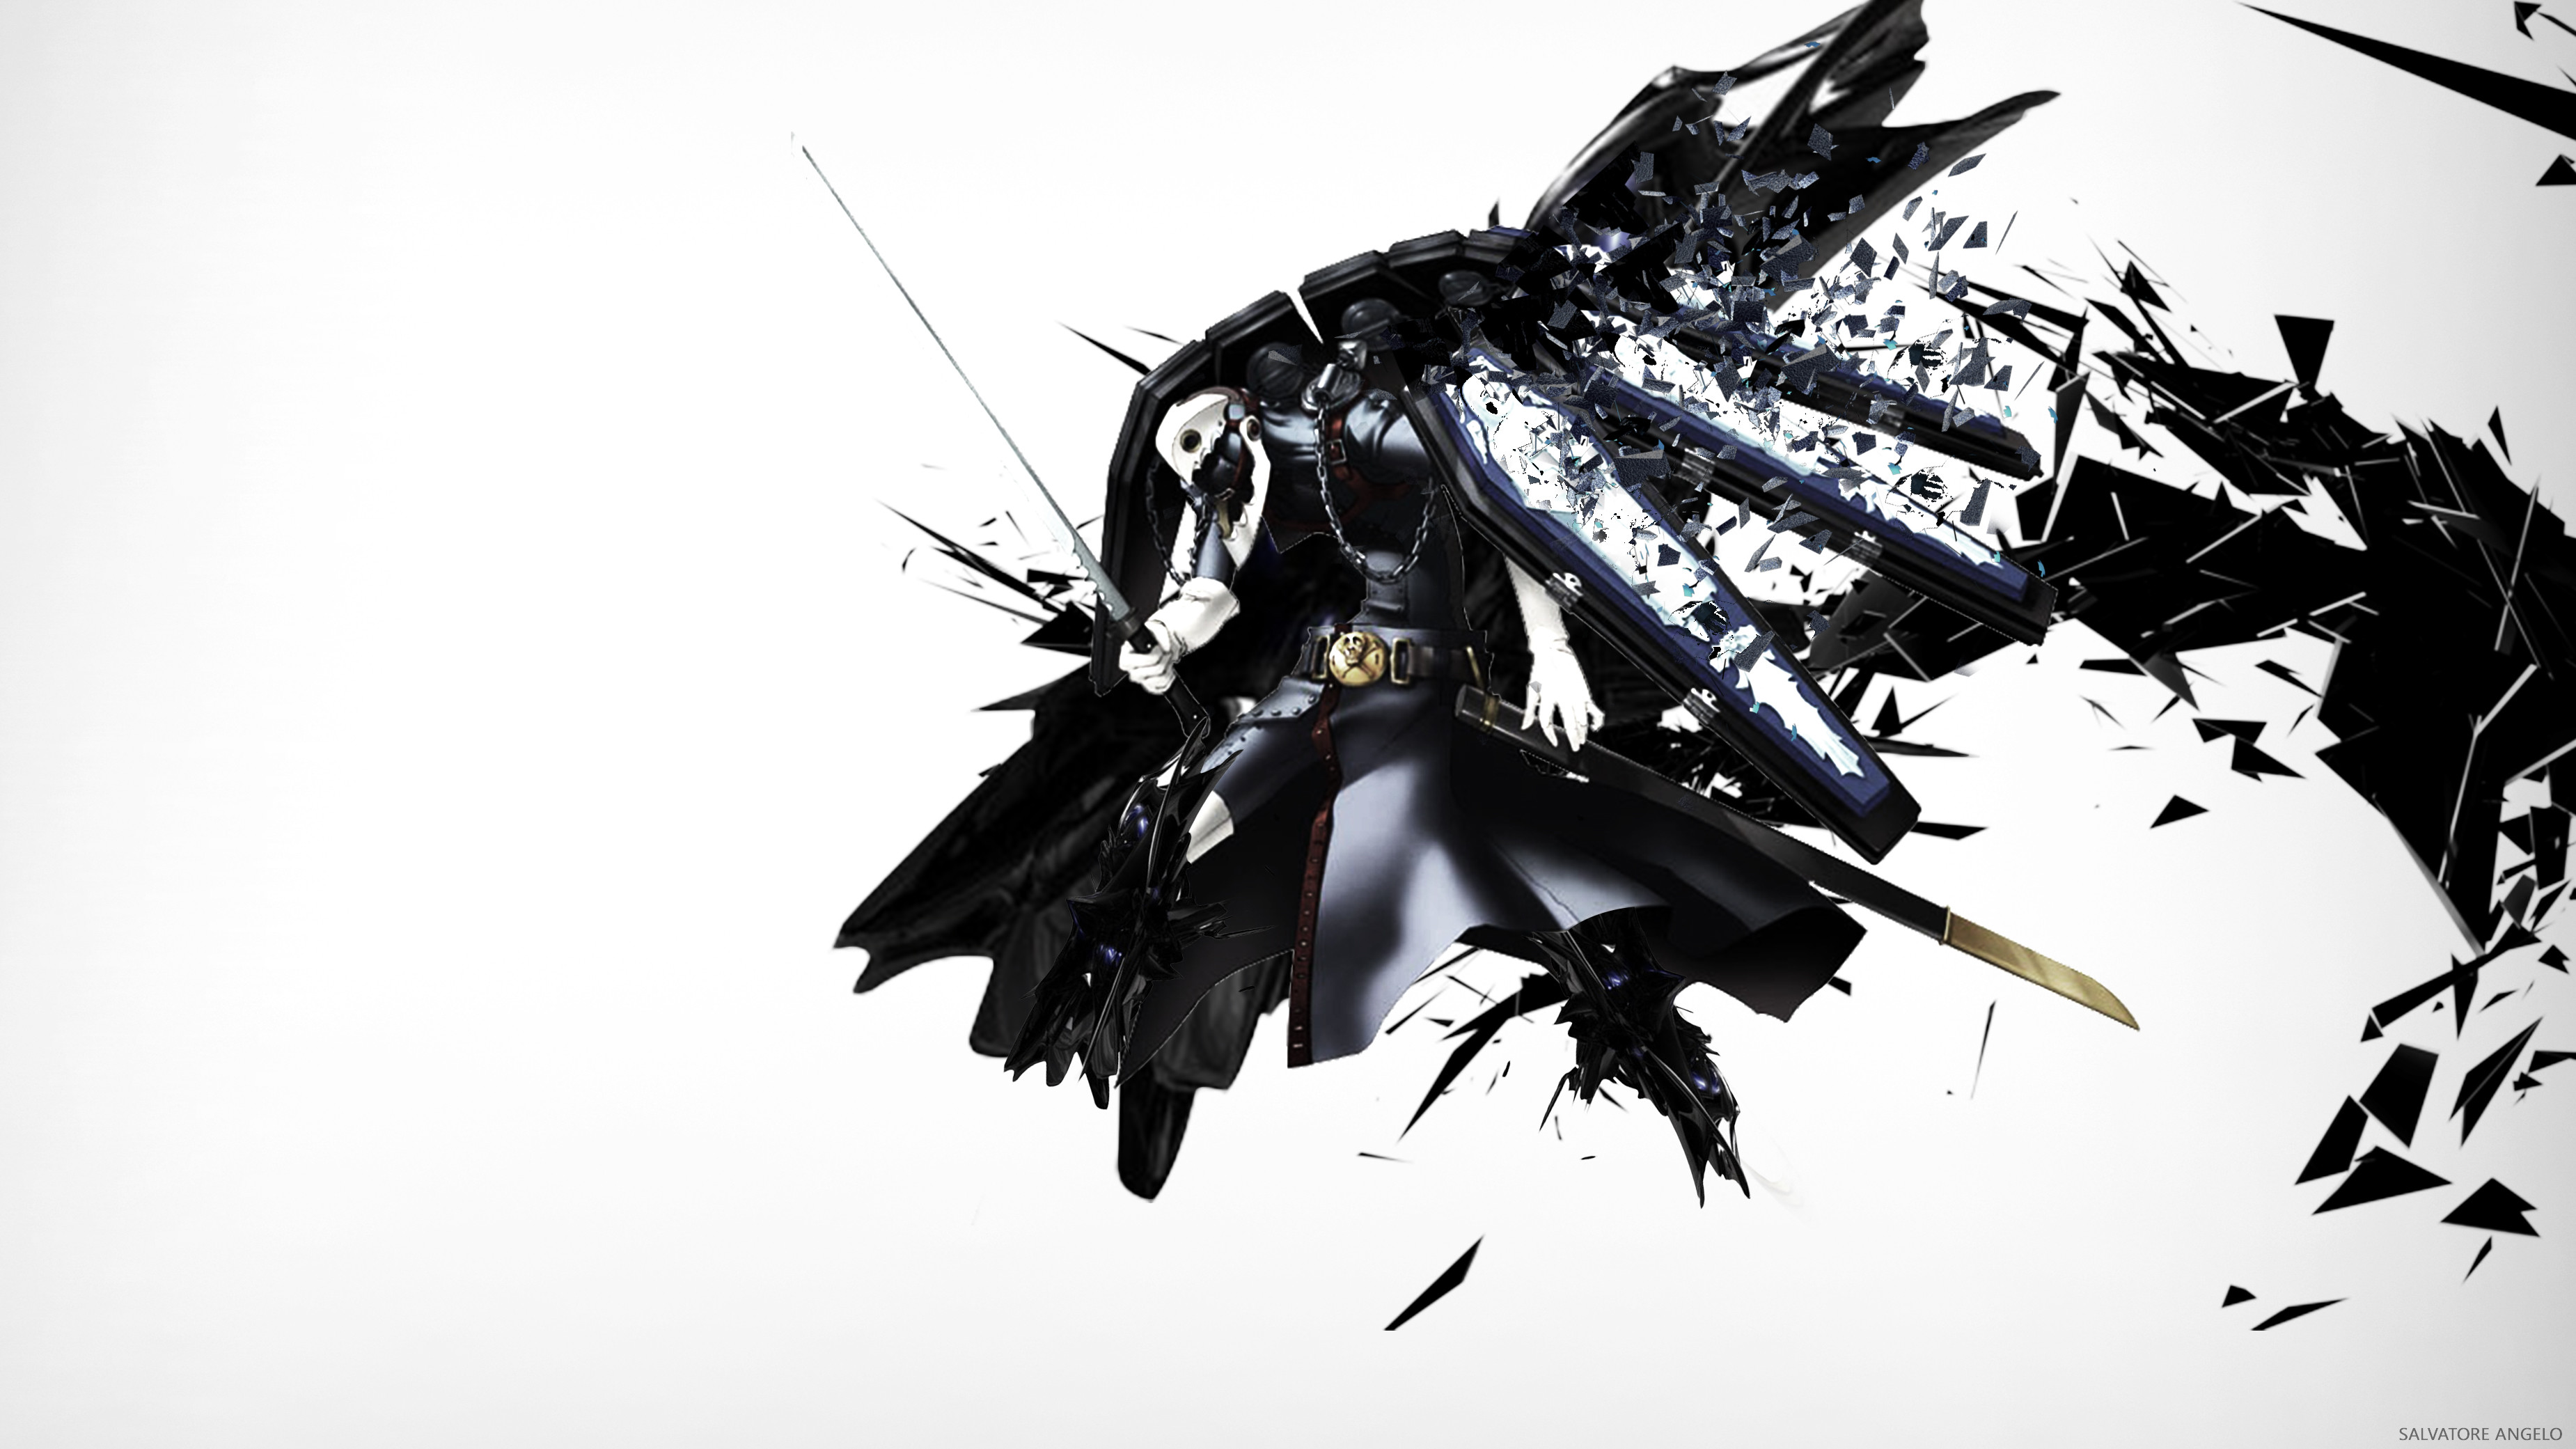 Persona 3 HD Wallpaper (68+ Images